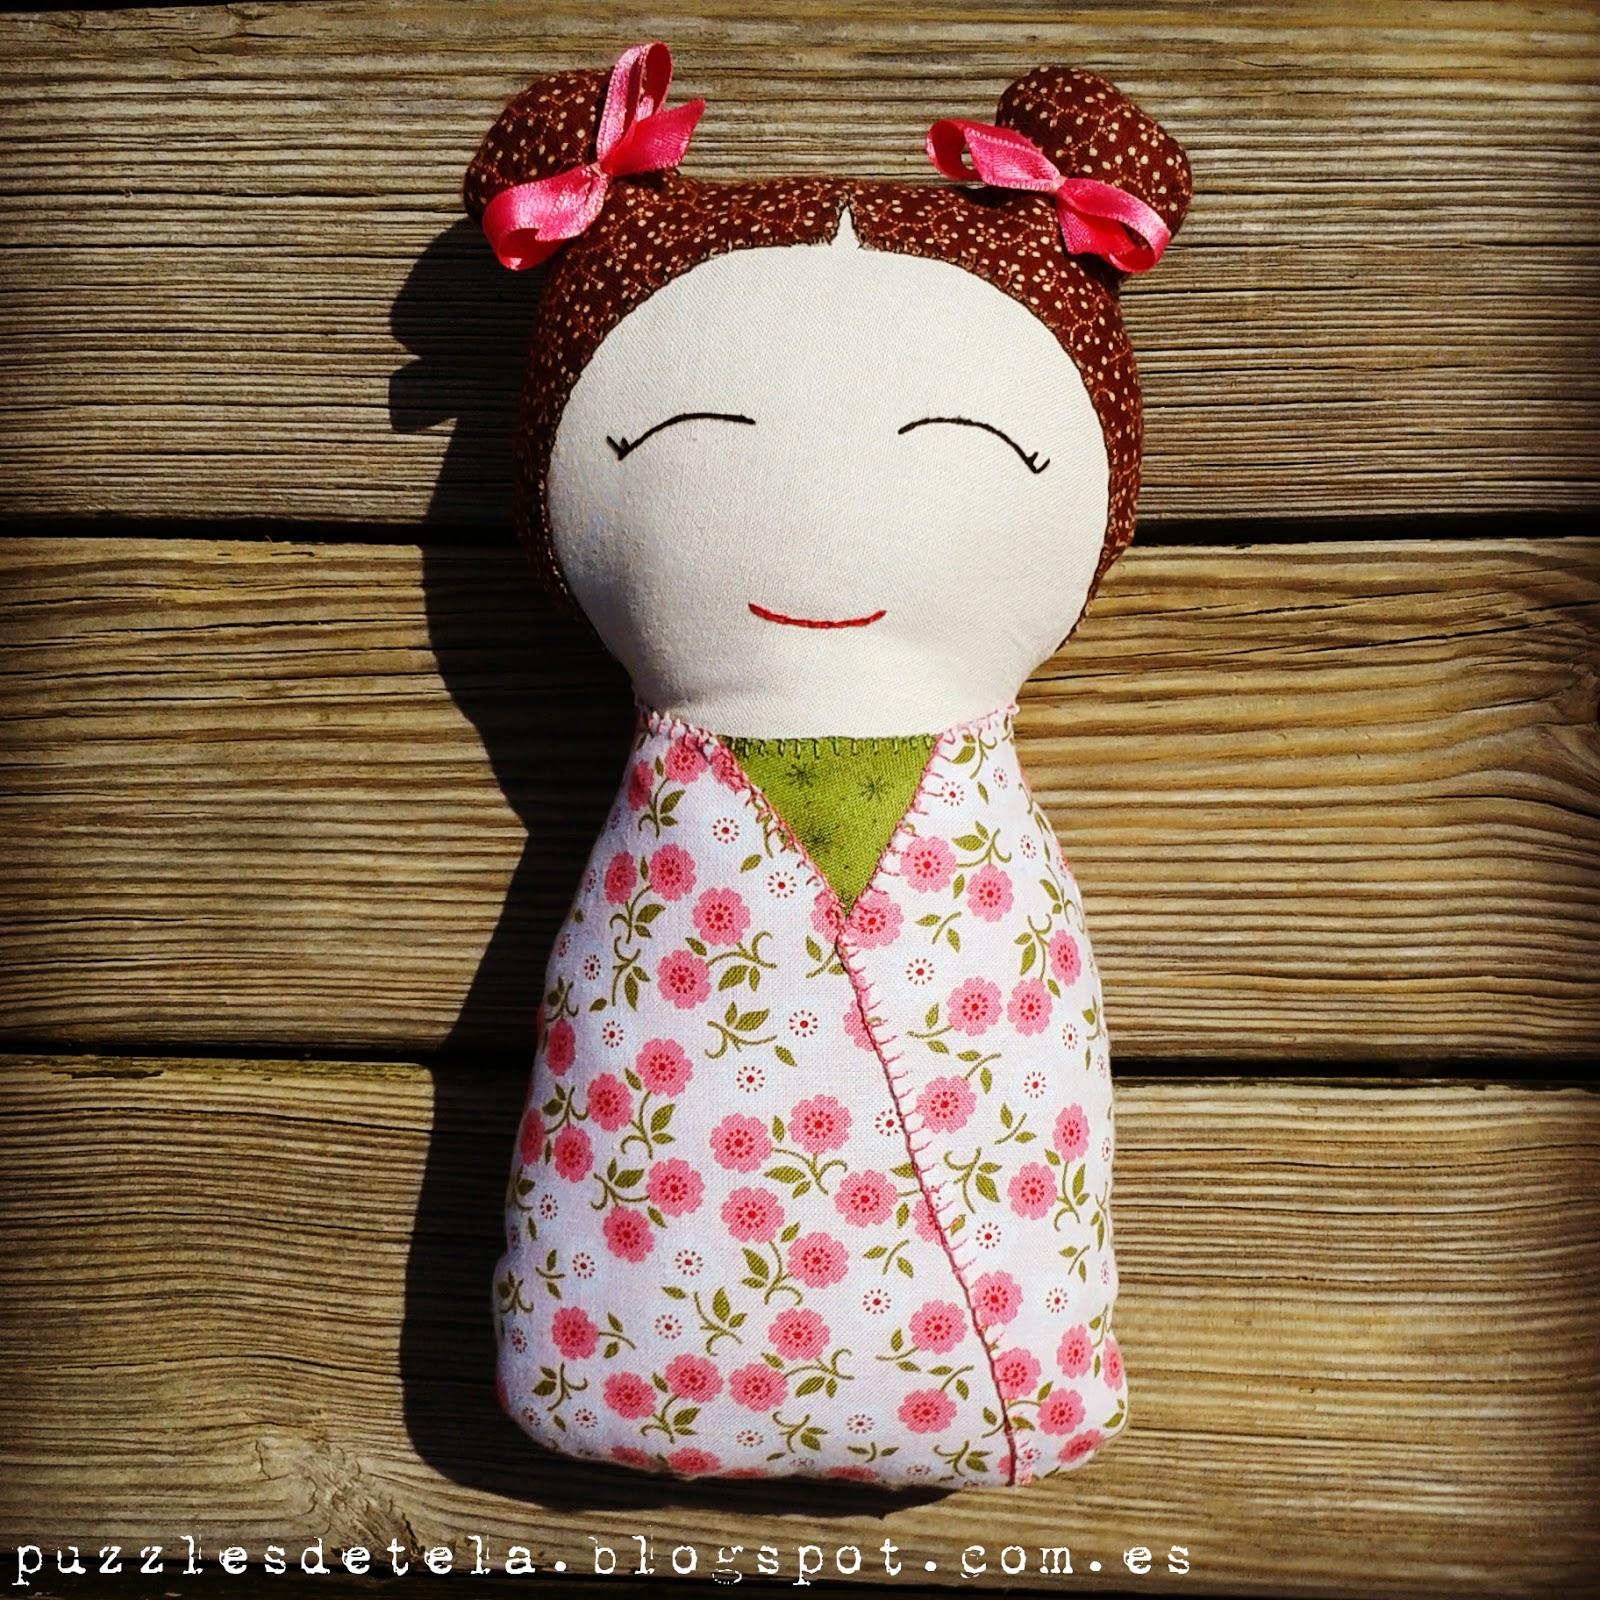 Patchwork, Kokeshi, muñecos, muñecos patchwork, muñeca kokeshi, muñeca de tela, muñeca de trapo, muñecas, puzzles de tela